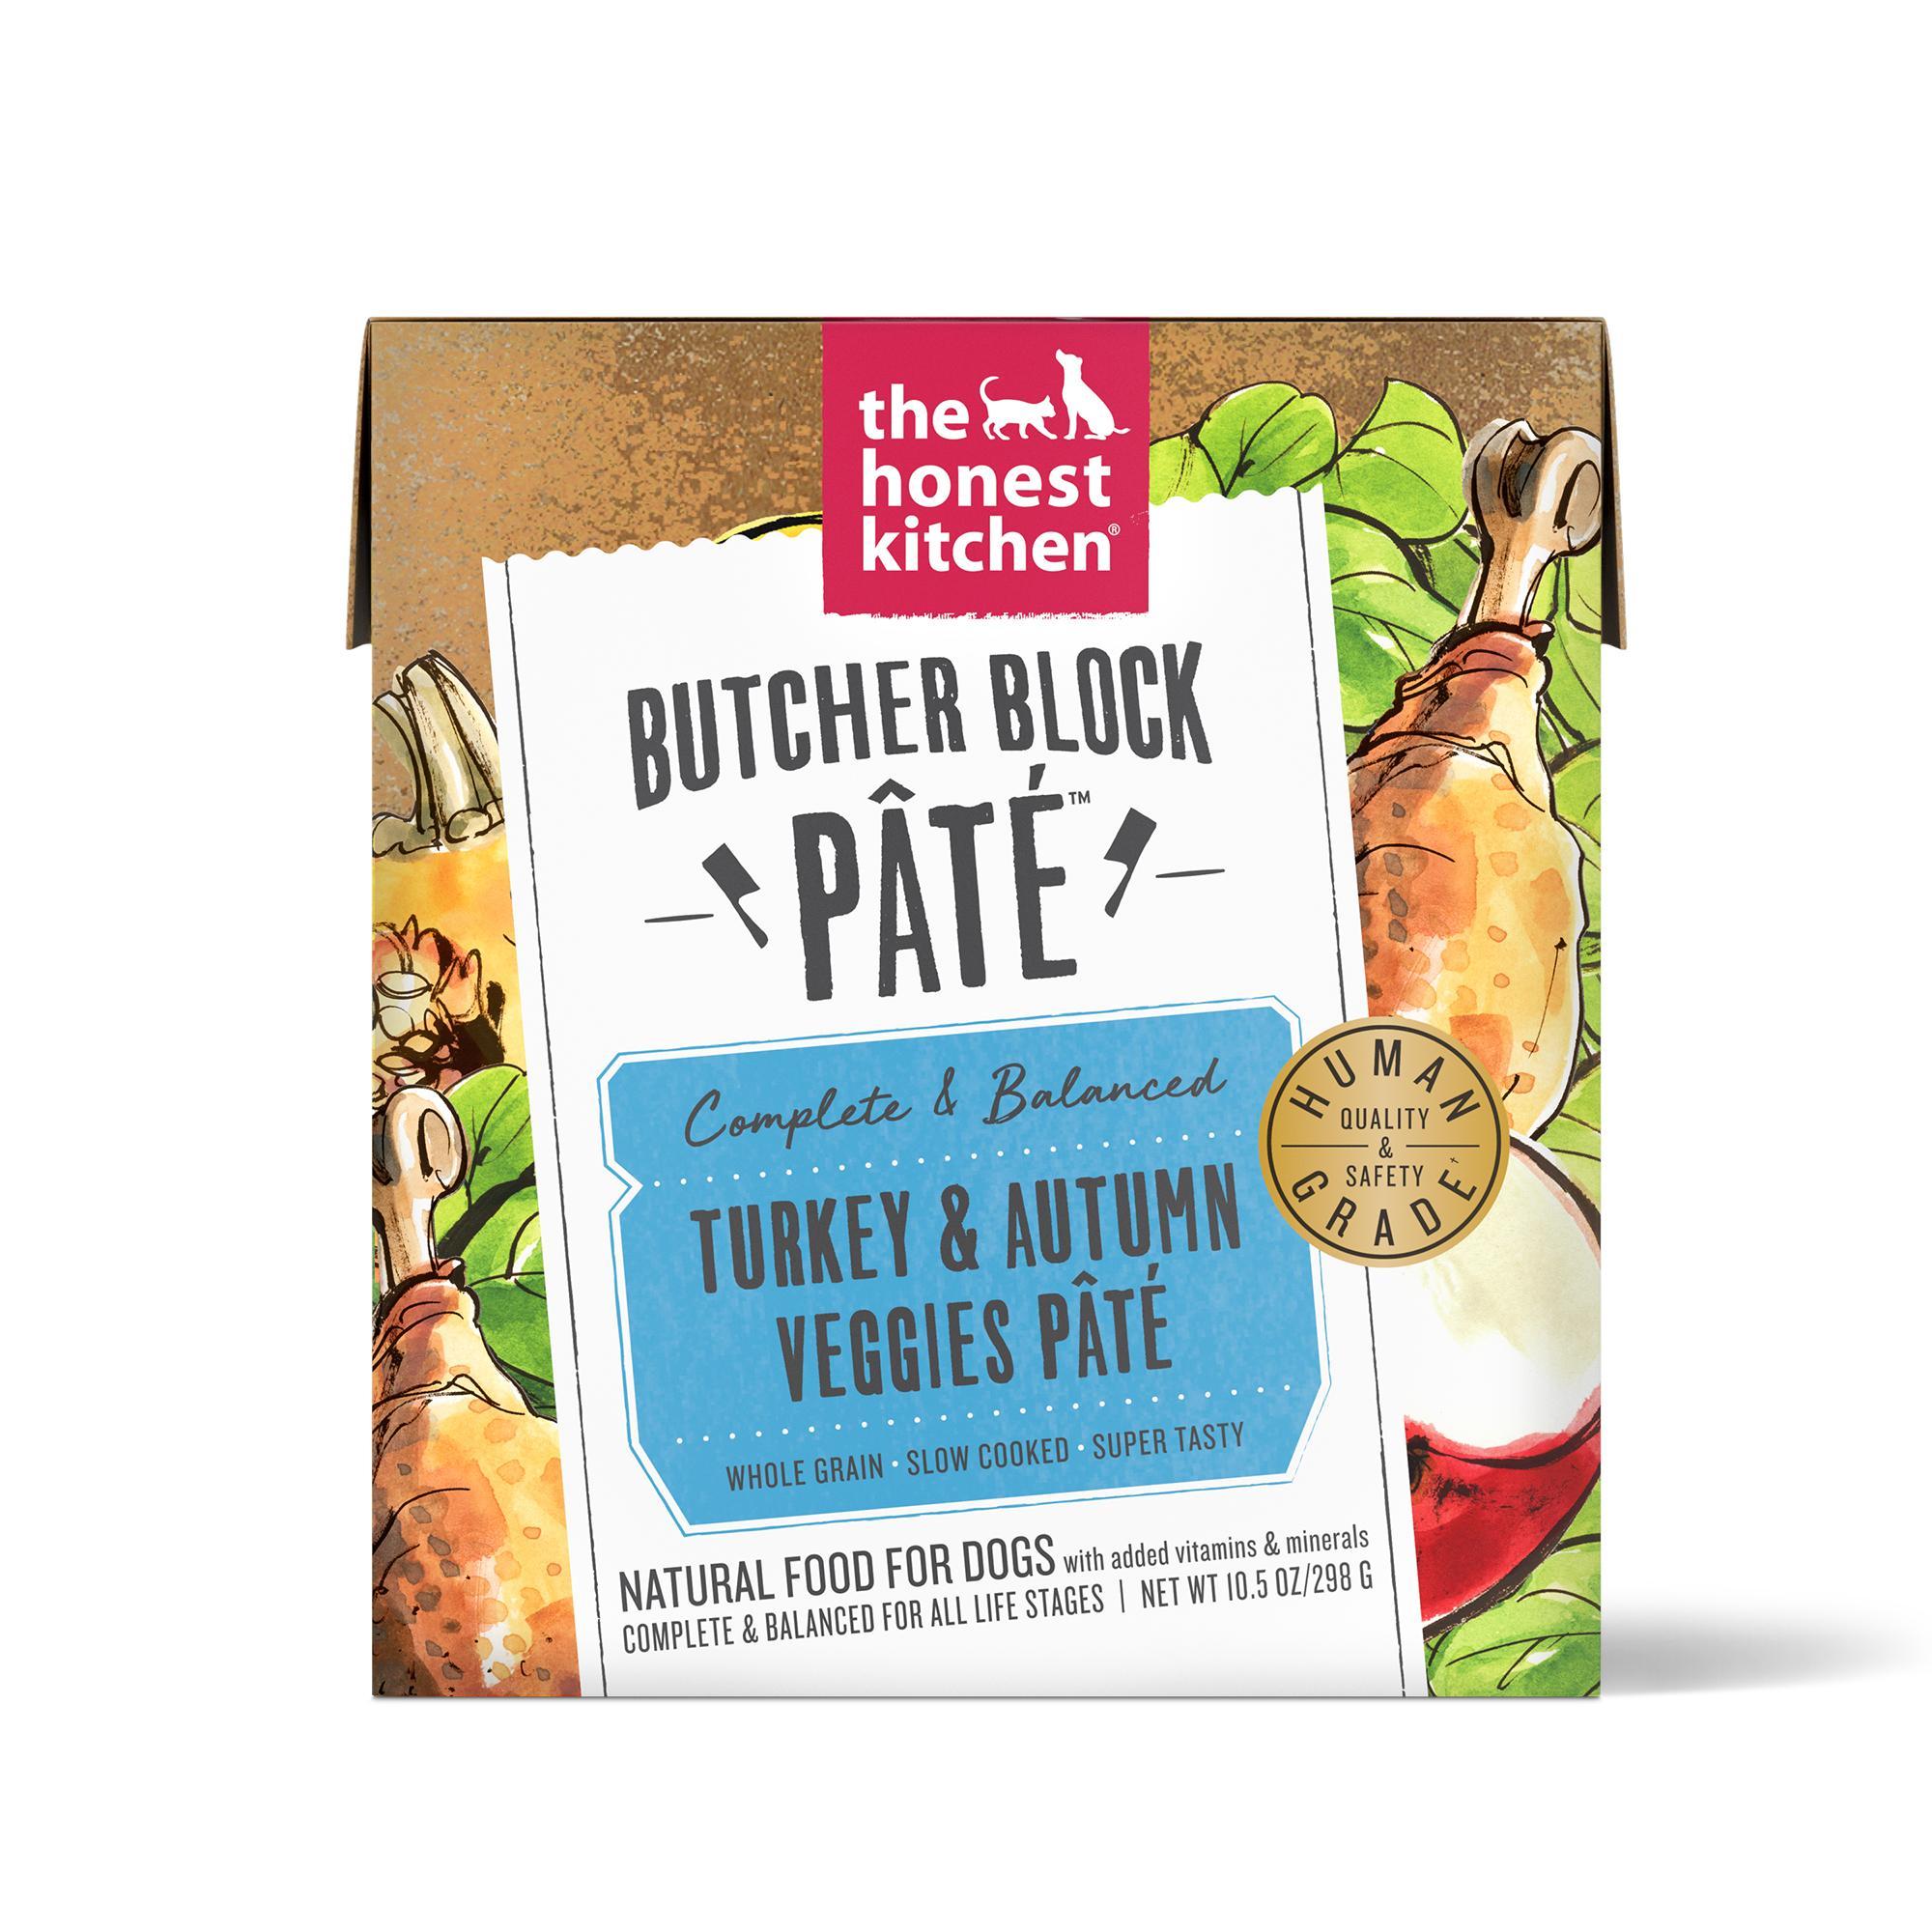 The Honest Kitchen Butcher Block Pate Turkey & Autumn Veggies Wet Dog Food, 10.5-oz